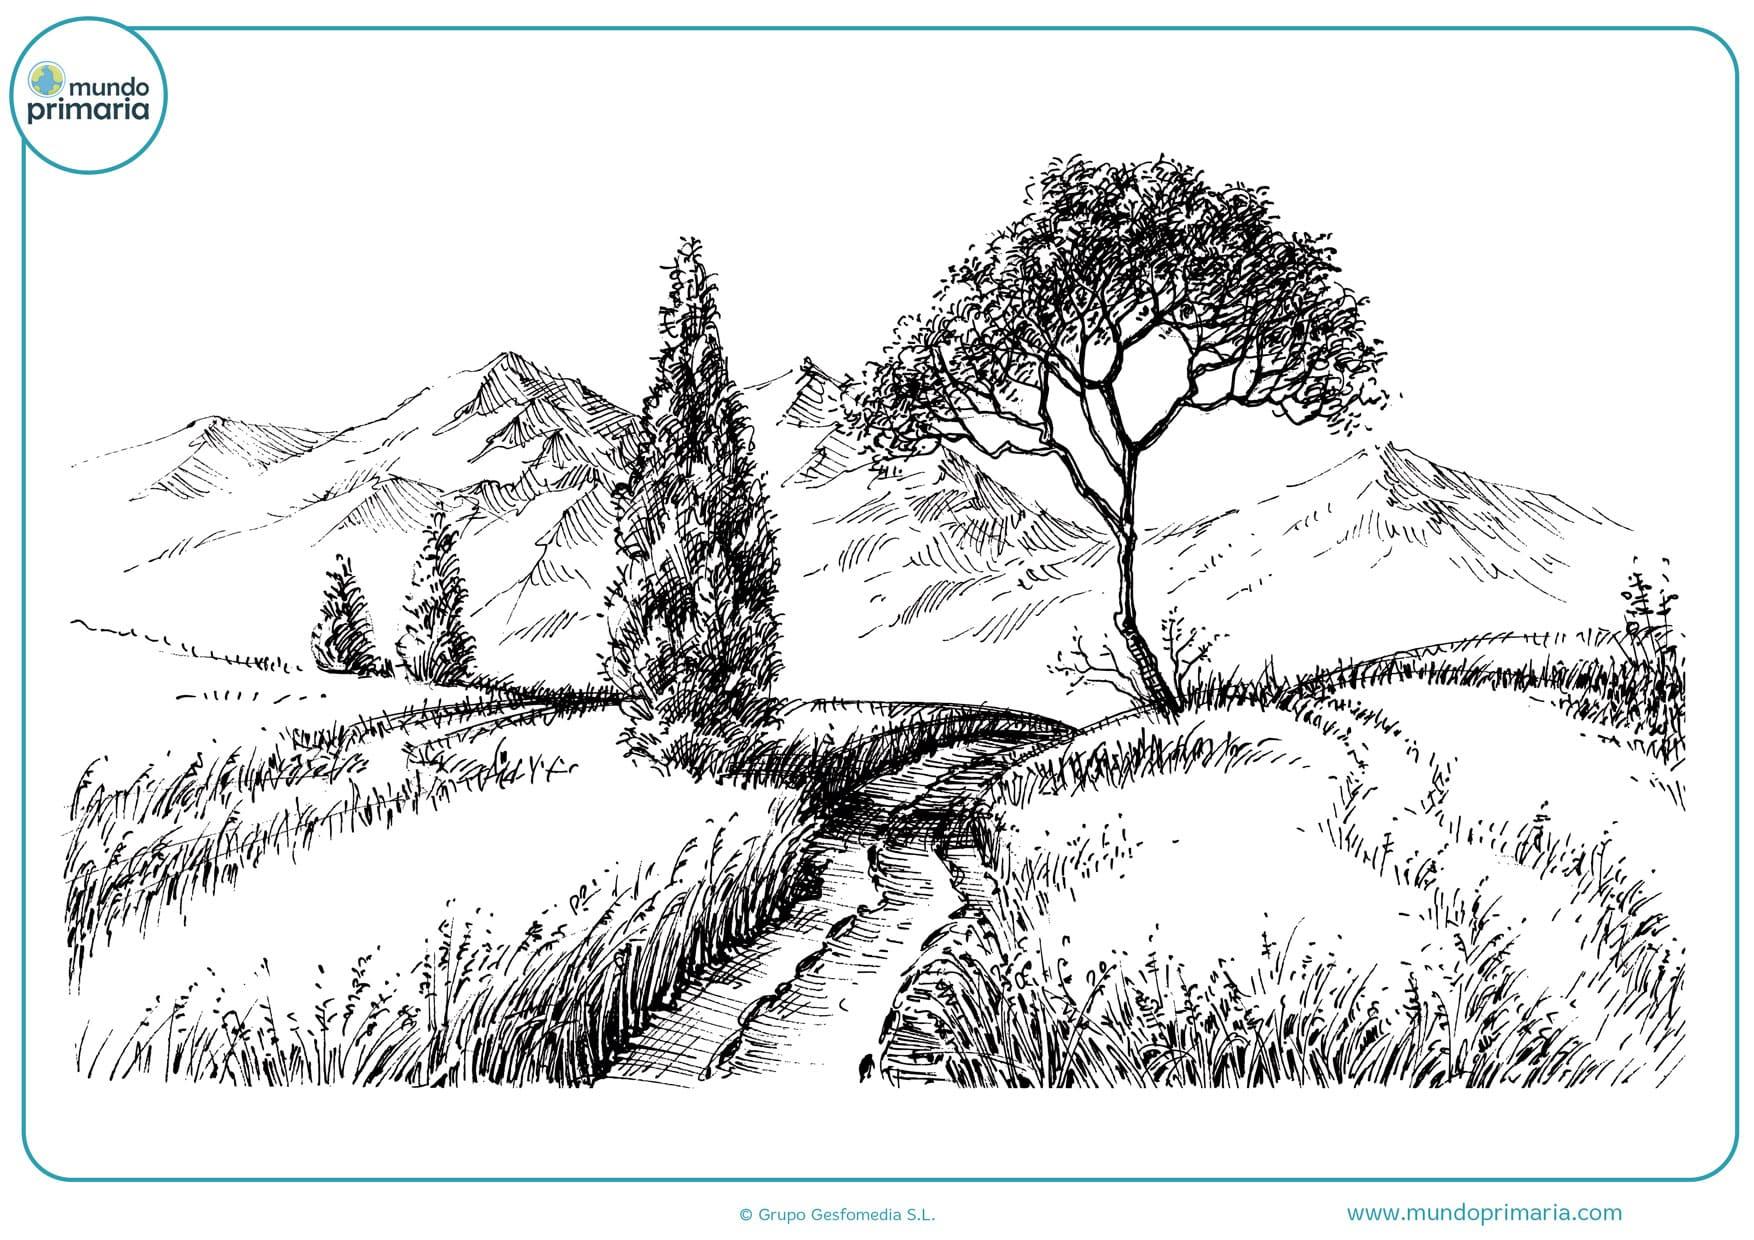 Dibujos A Lápiz Fáciles Para Copiar Paso A Paso 500